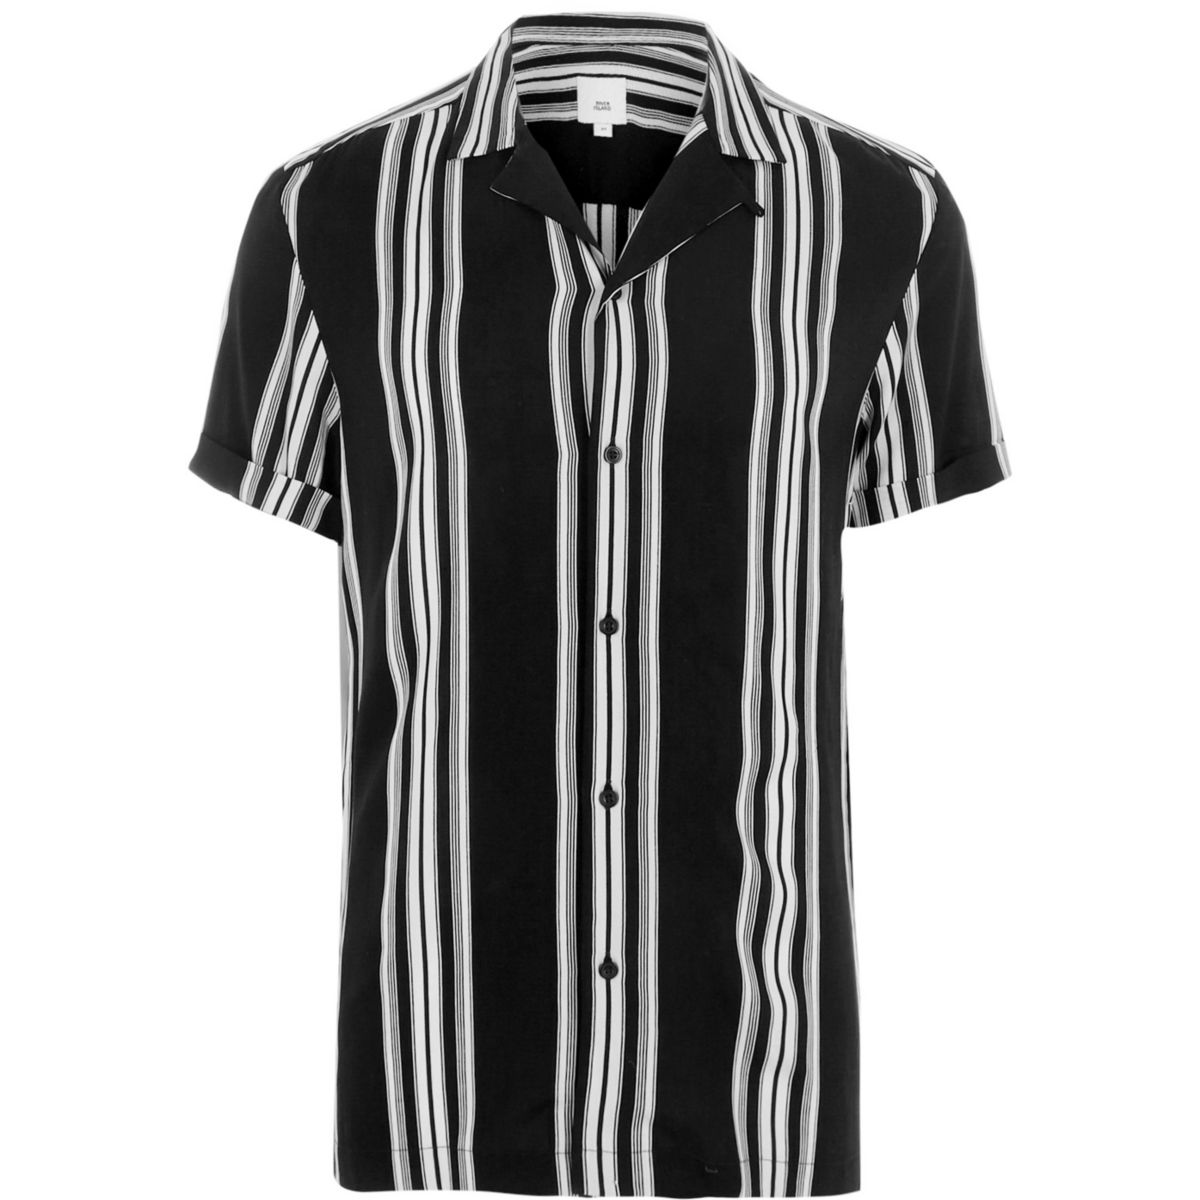 Chemise casual manches courtes à rayures noires et blanches